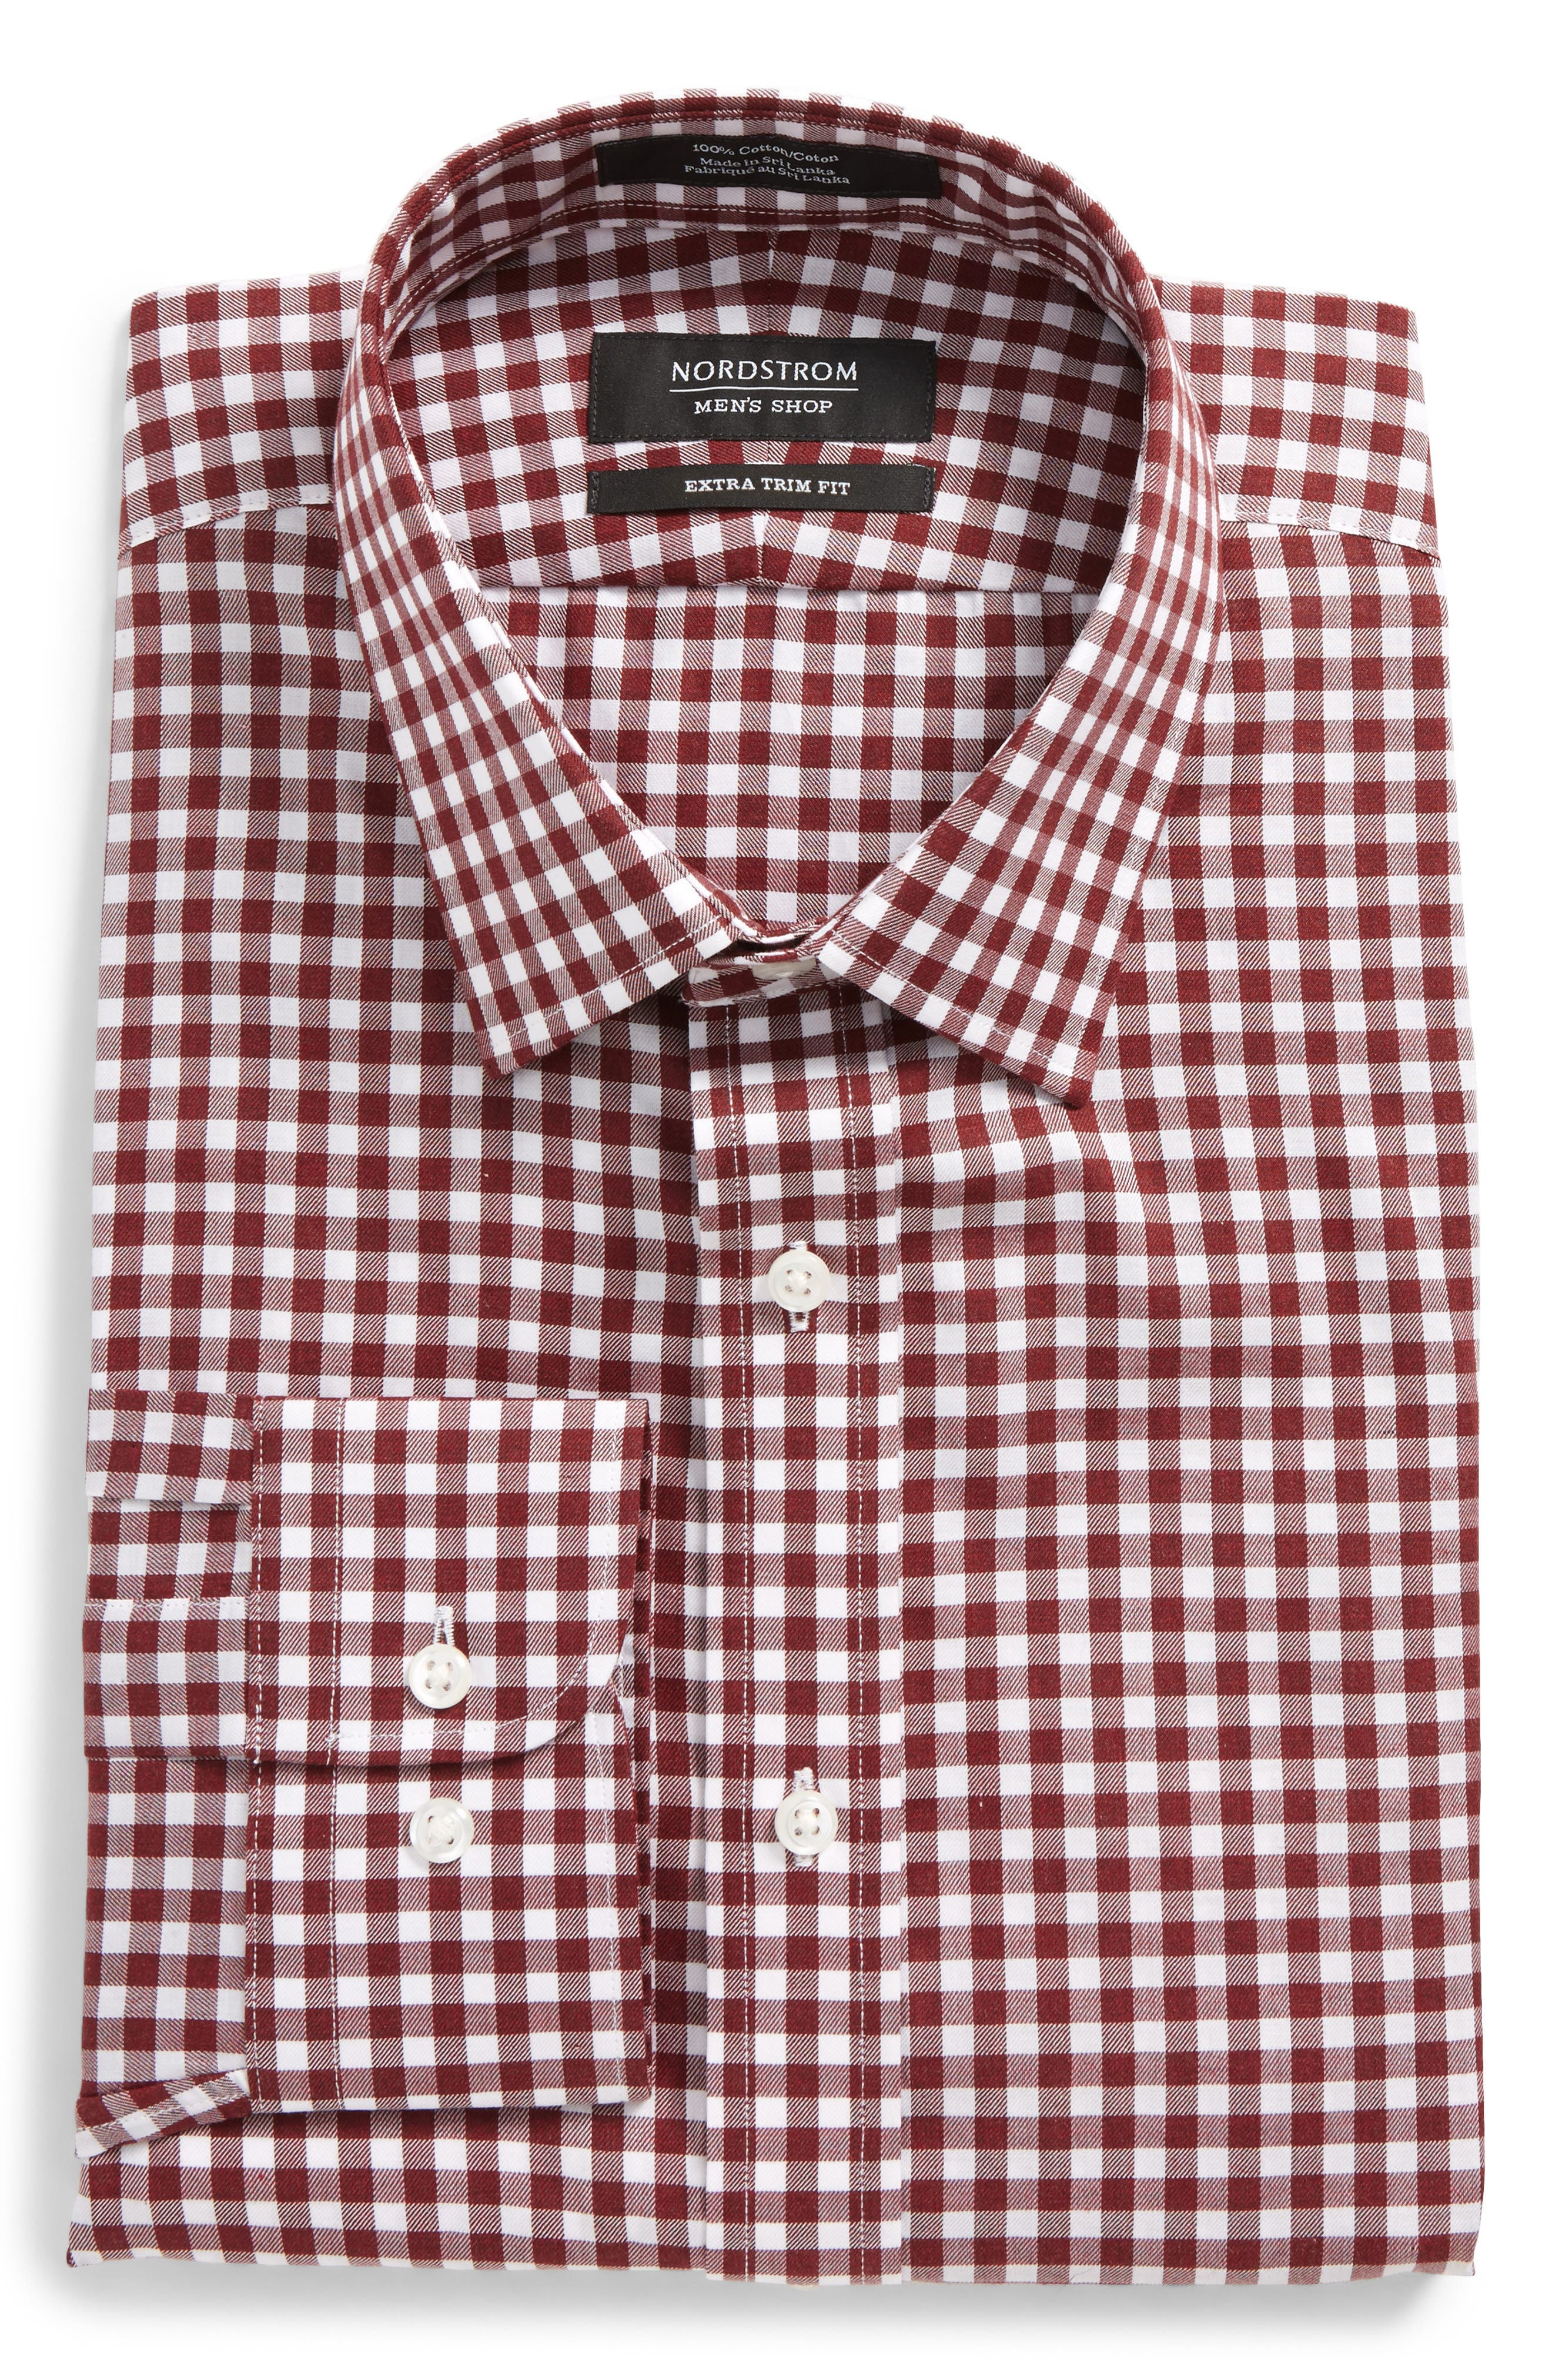 Main Image - Nordstrom Men's Shop Extra Trim Fit Check Dress Shirt